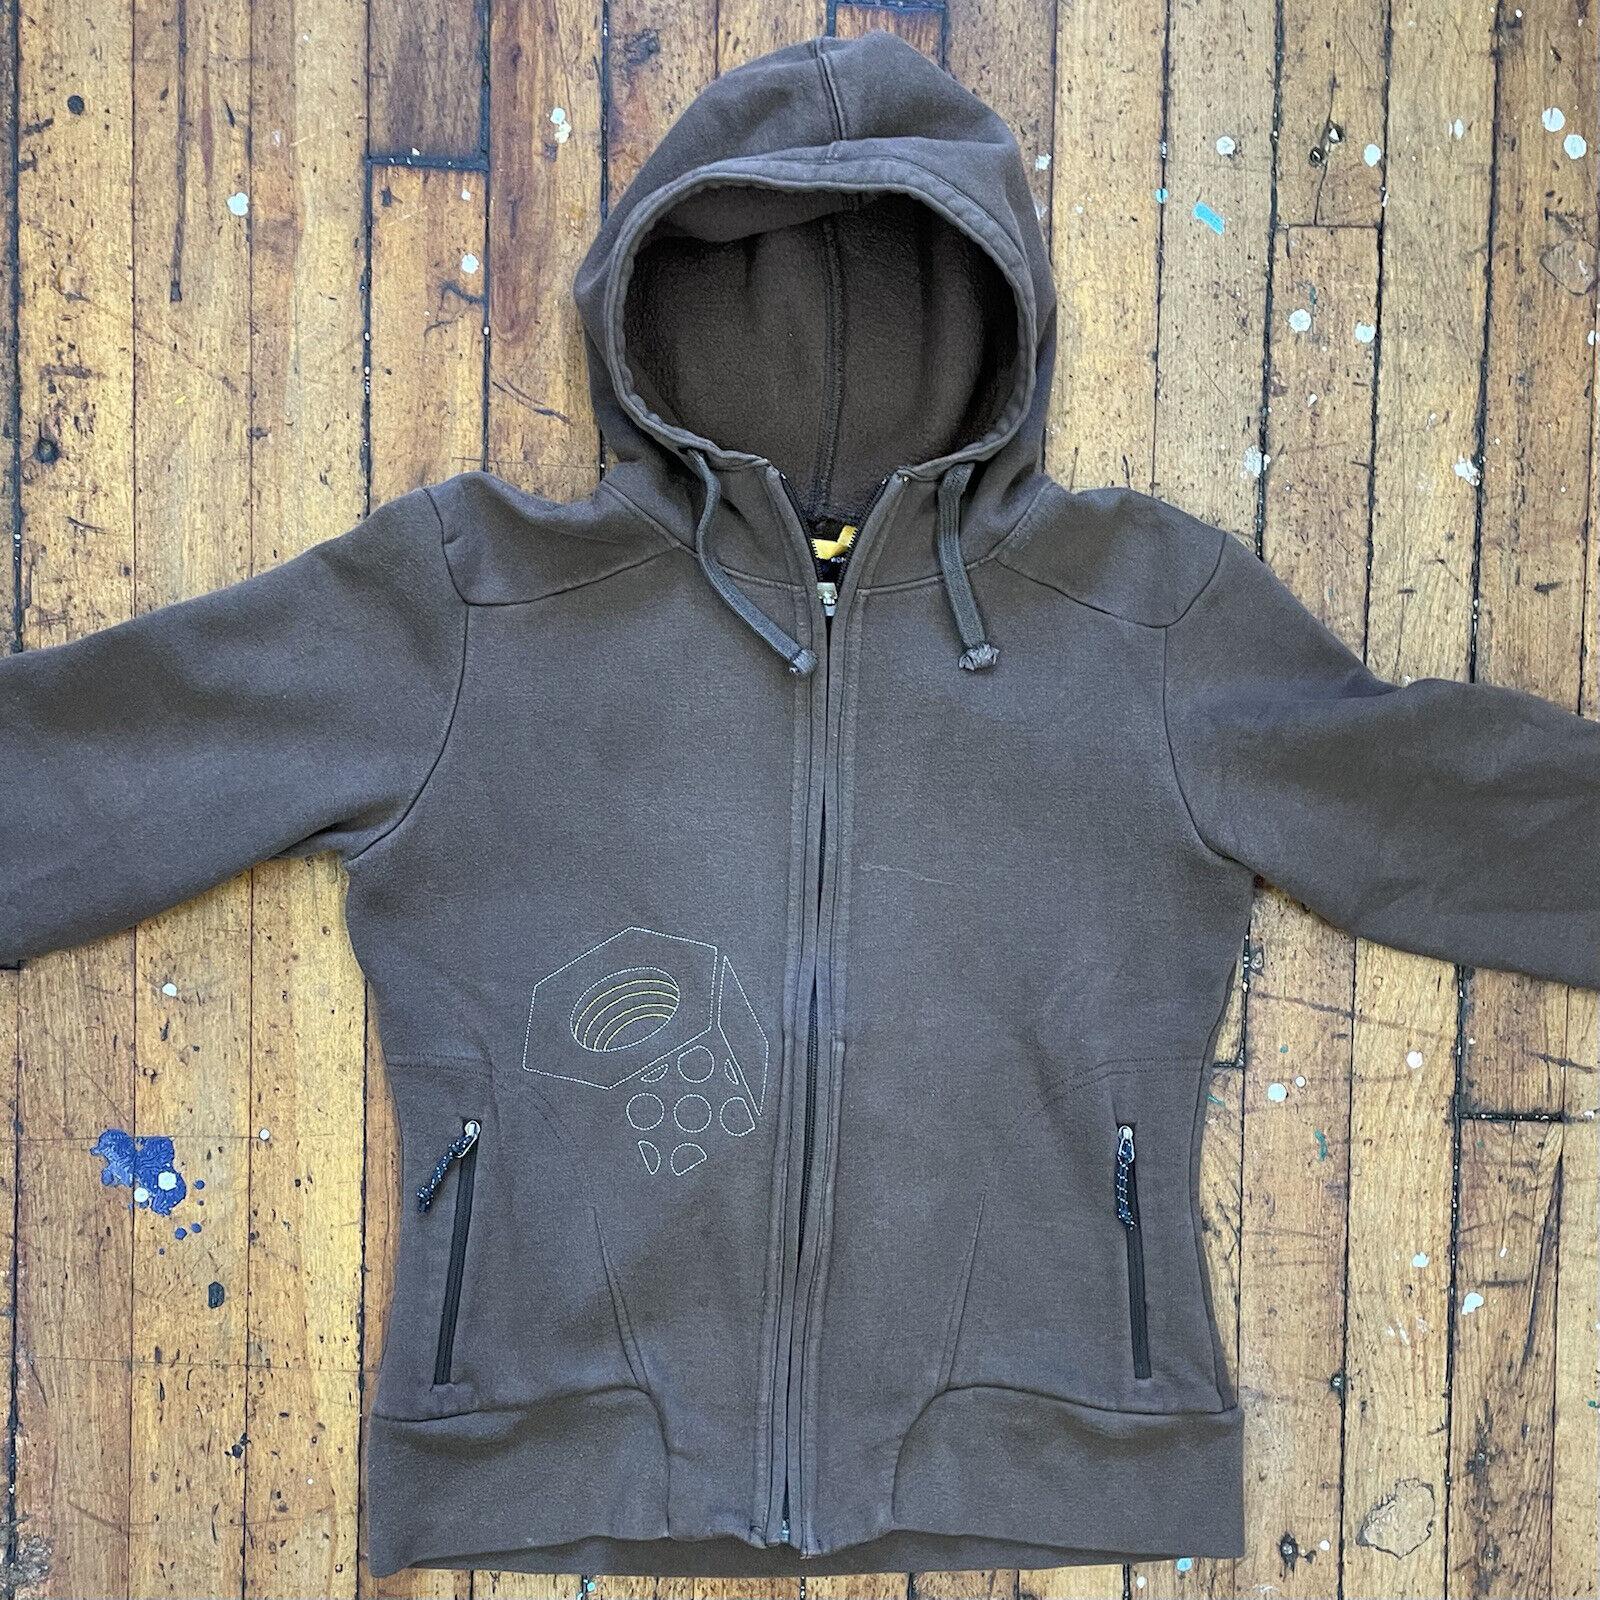 Mountain Hard Wear Women's Medium Tan/ Brown Full Zip Hooded Sweatshirt